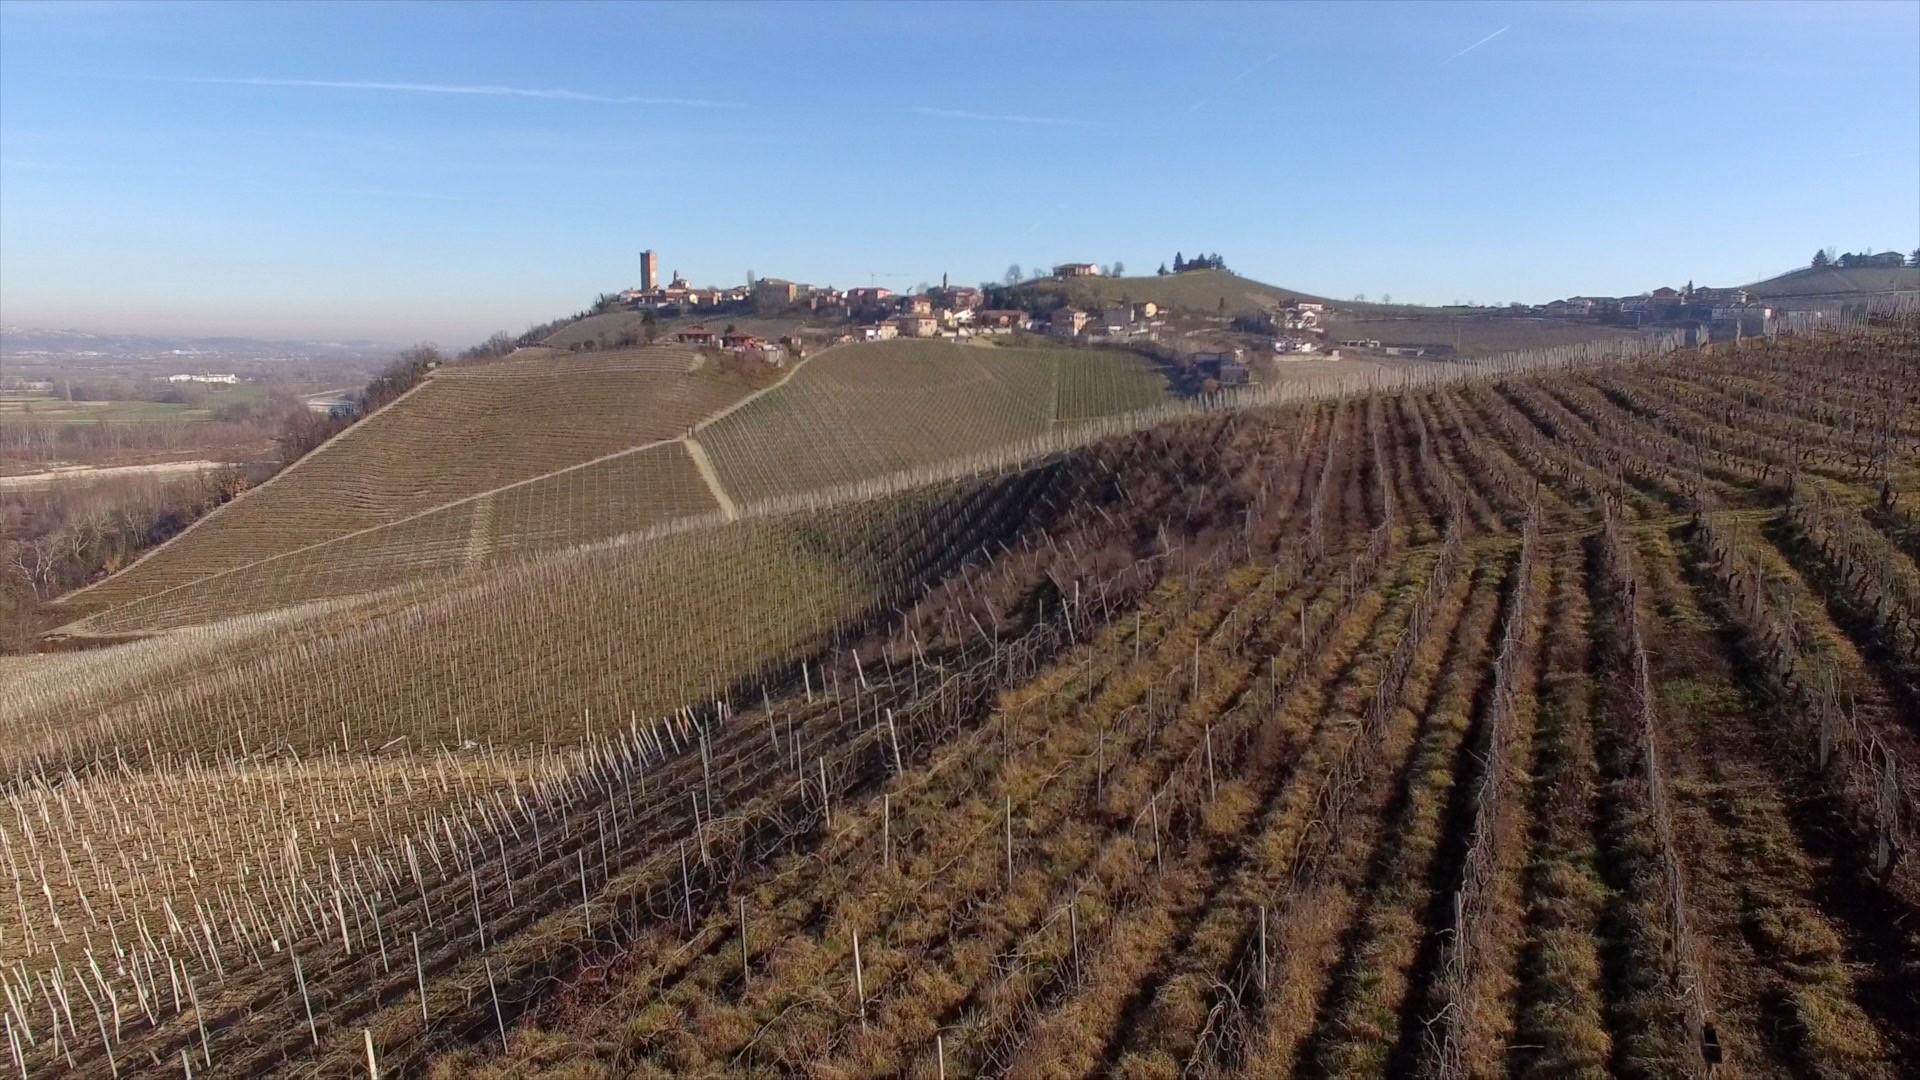 Gaja. Barbaresco winery in Piemonte